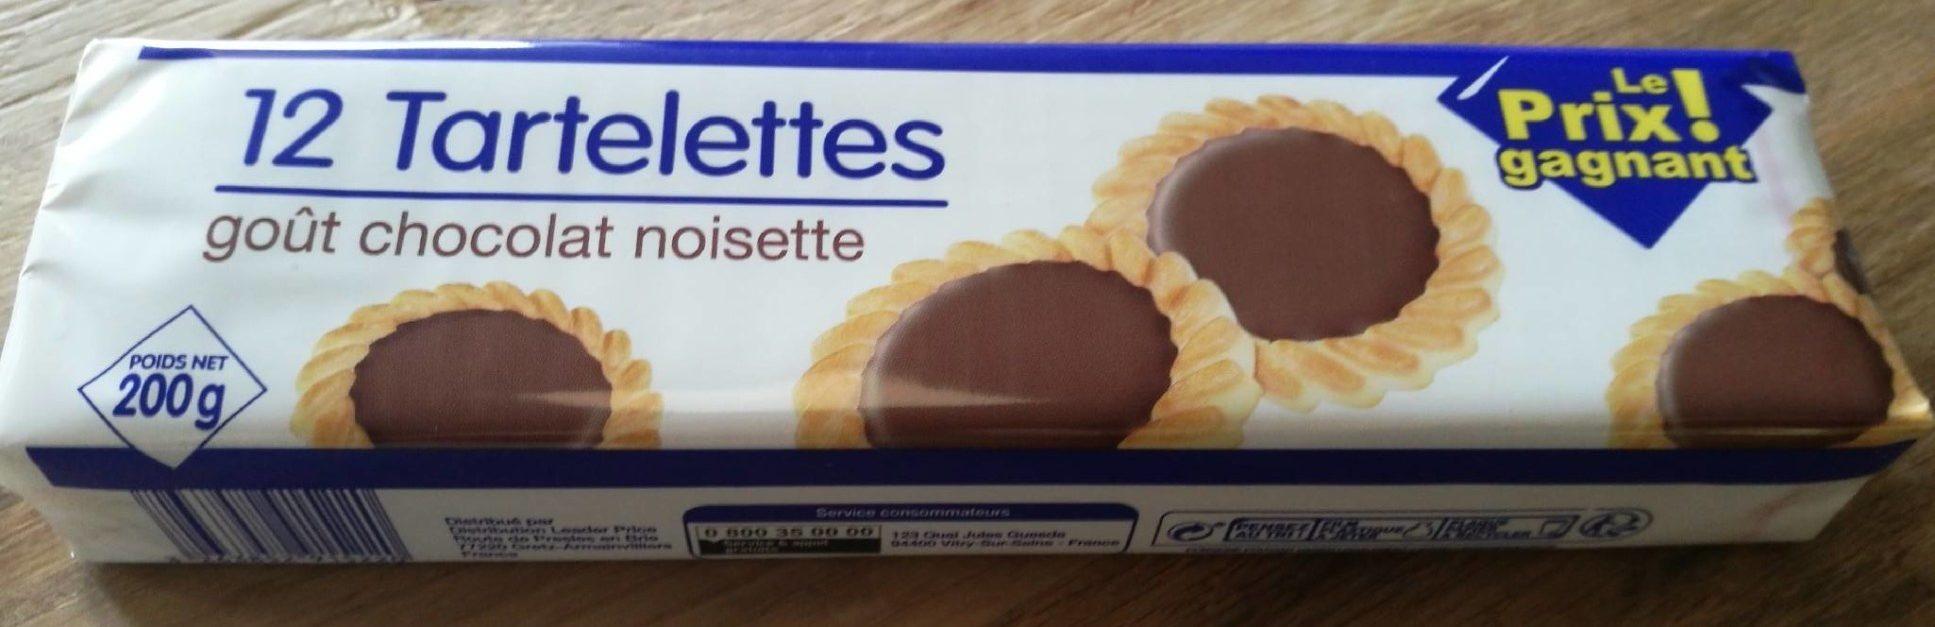 12 Tartelettes Goût Chocolat Noisettes - Product - fr